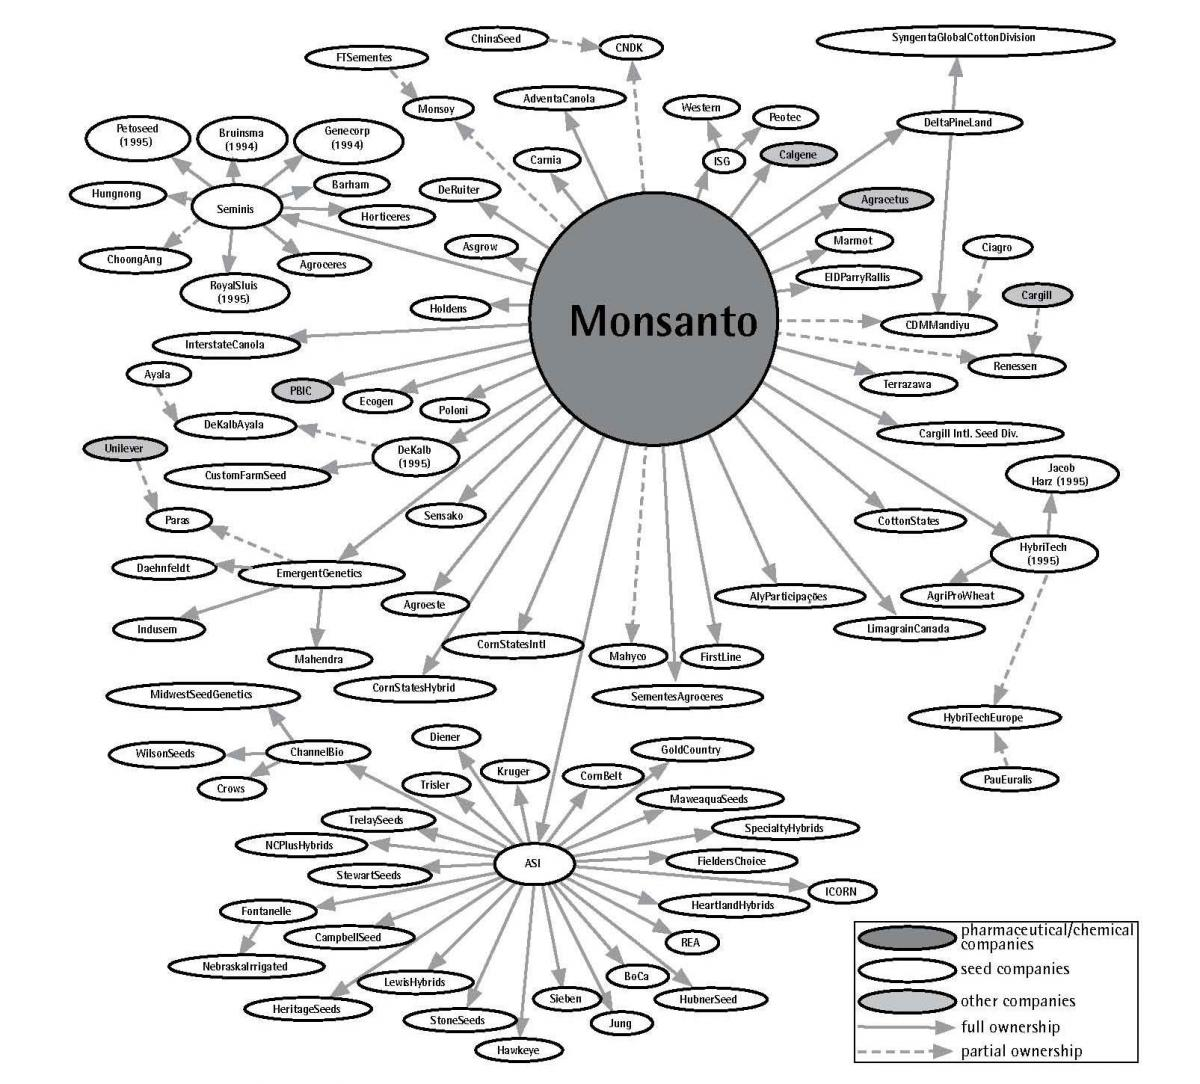 monsanto, μονσαντο, δίκτυο, σπόροι, βιομηχανία, αγορά, γ.τ.ο.